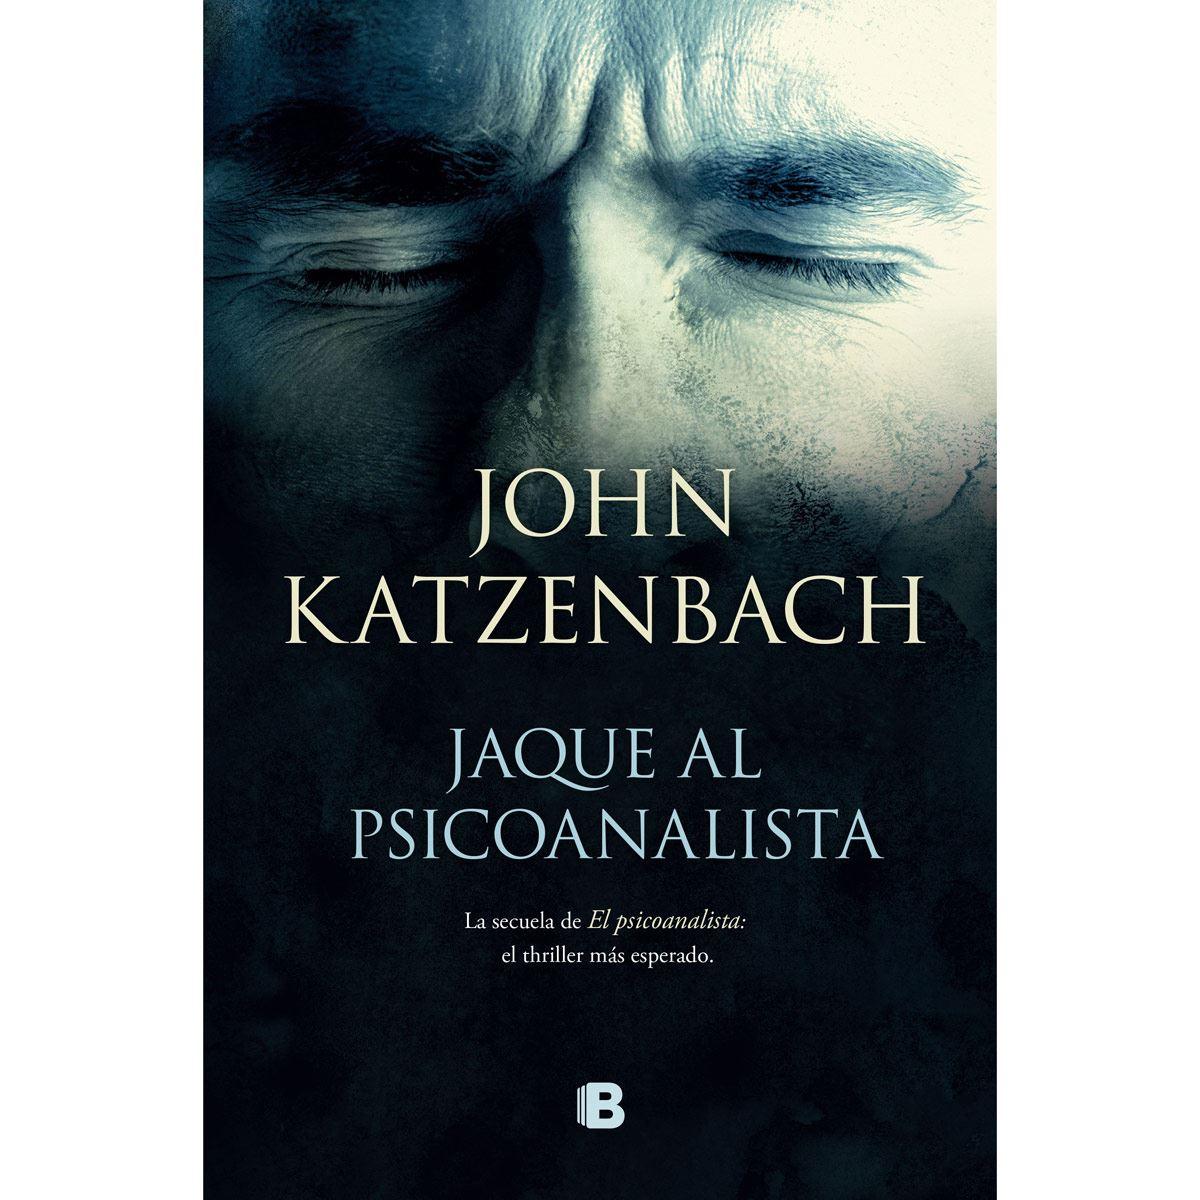 Jaque al psicoanalista (Sanborns)